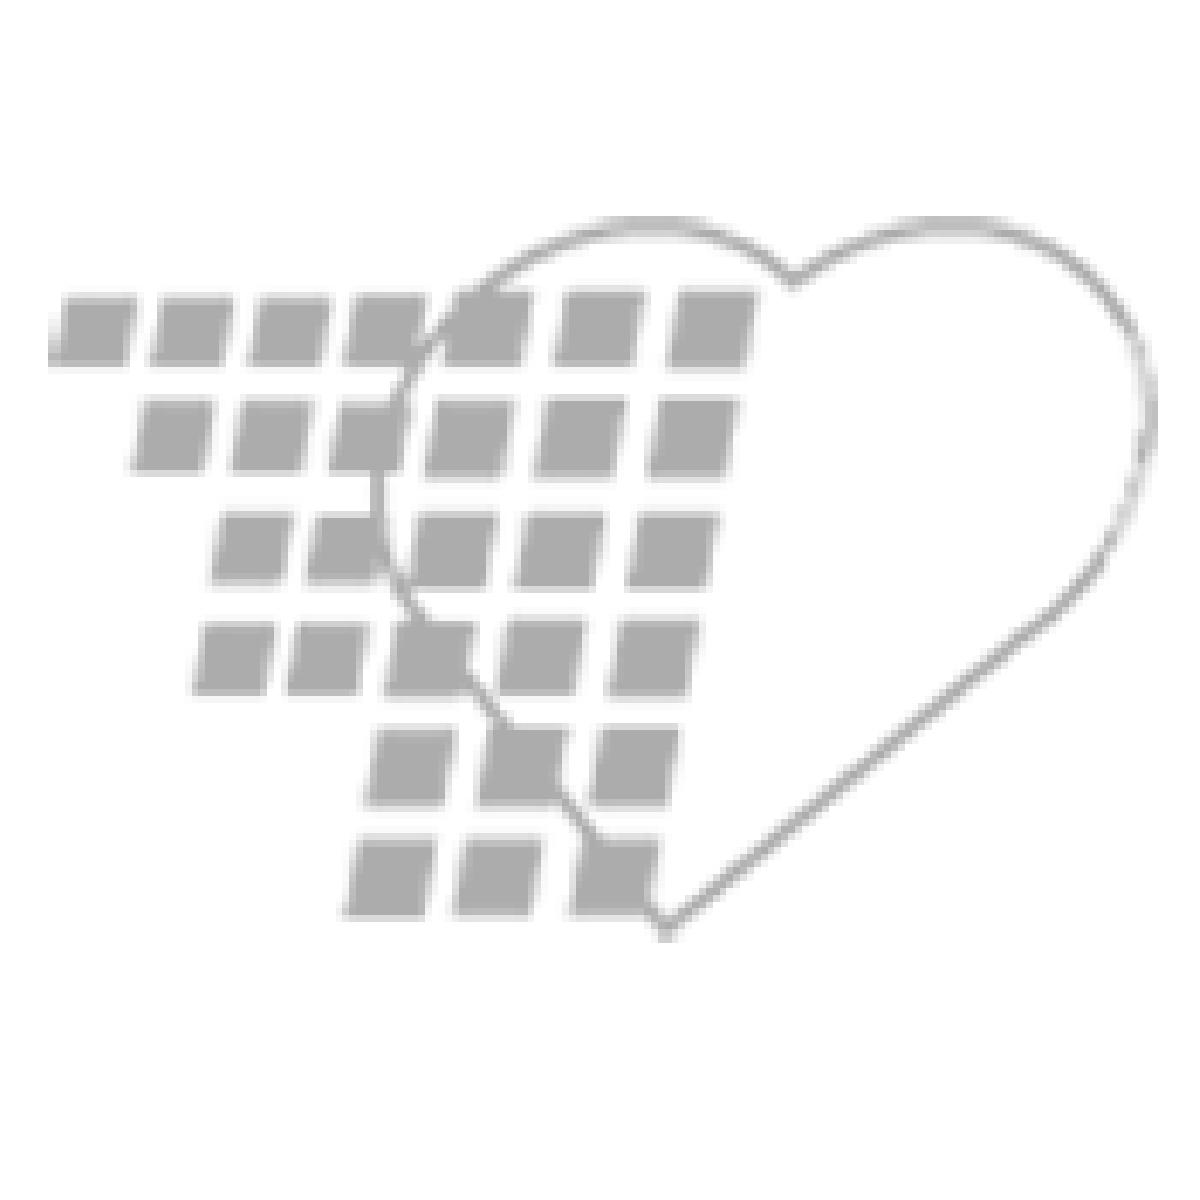 06-93-9015 - Demo Dose® Vitamn K Phytondion 1mL Ampule 10 mg/mL